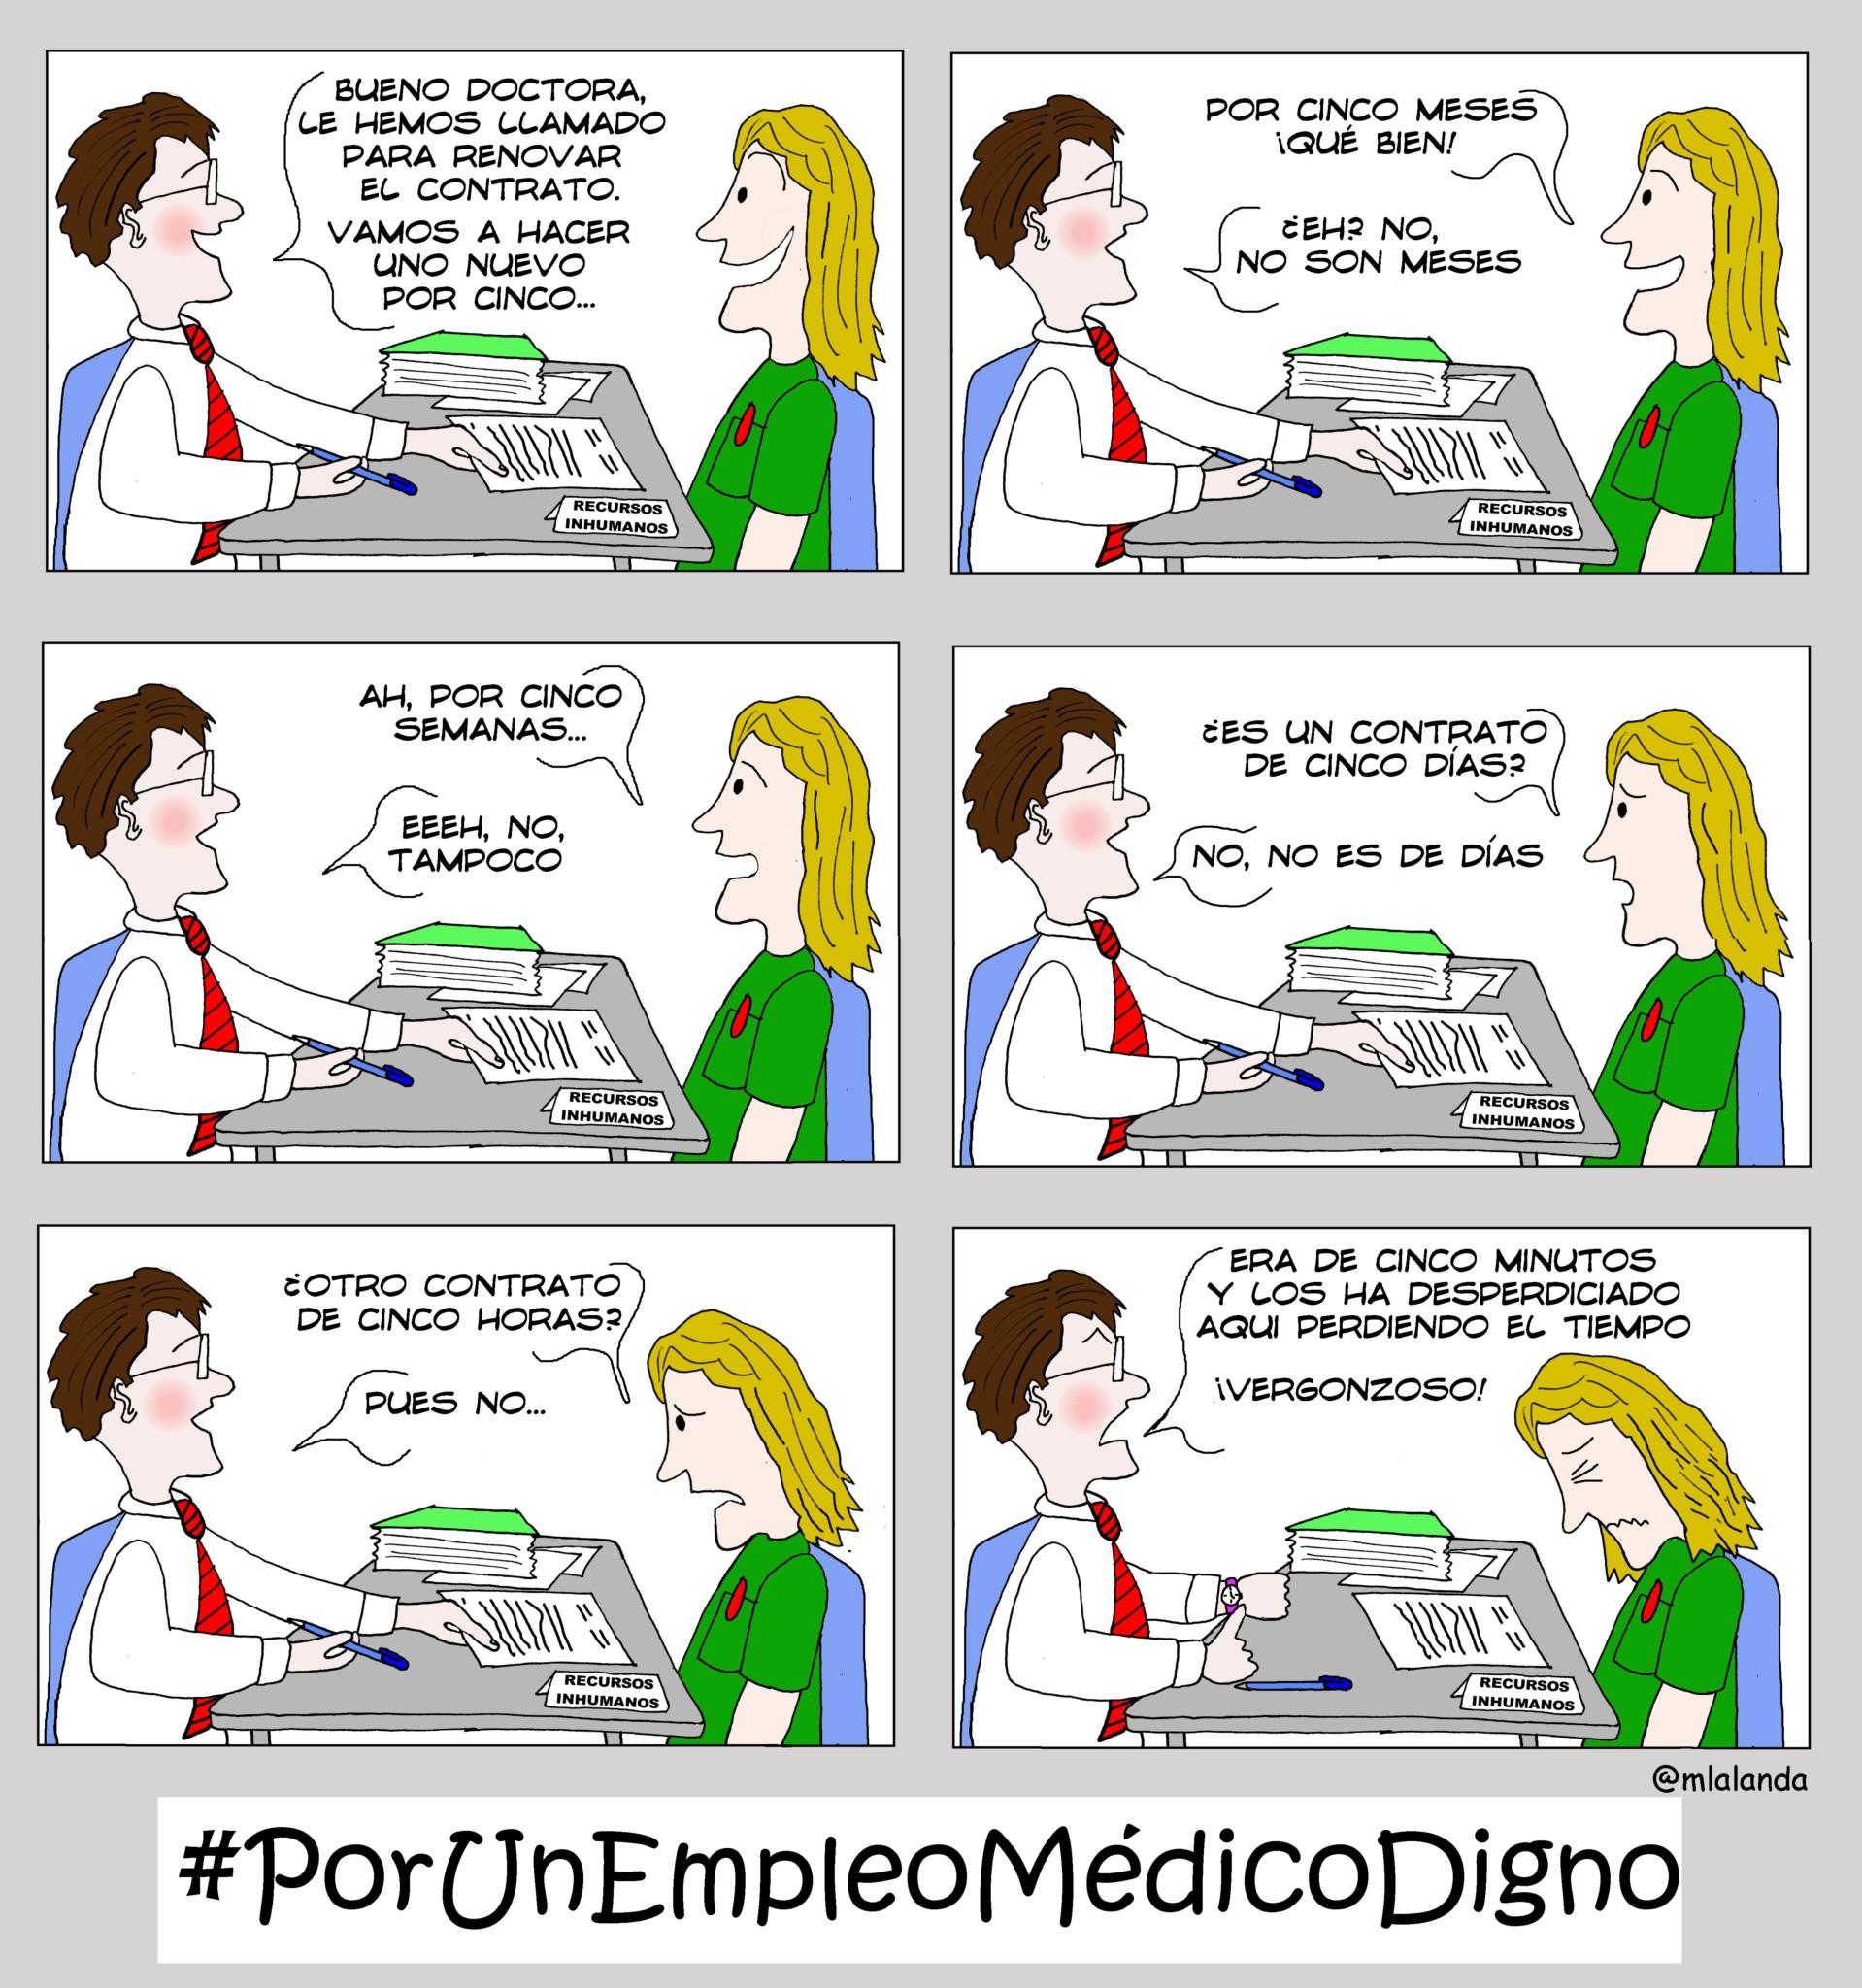 PorUnEmpleoMedicoDigno